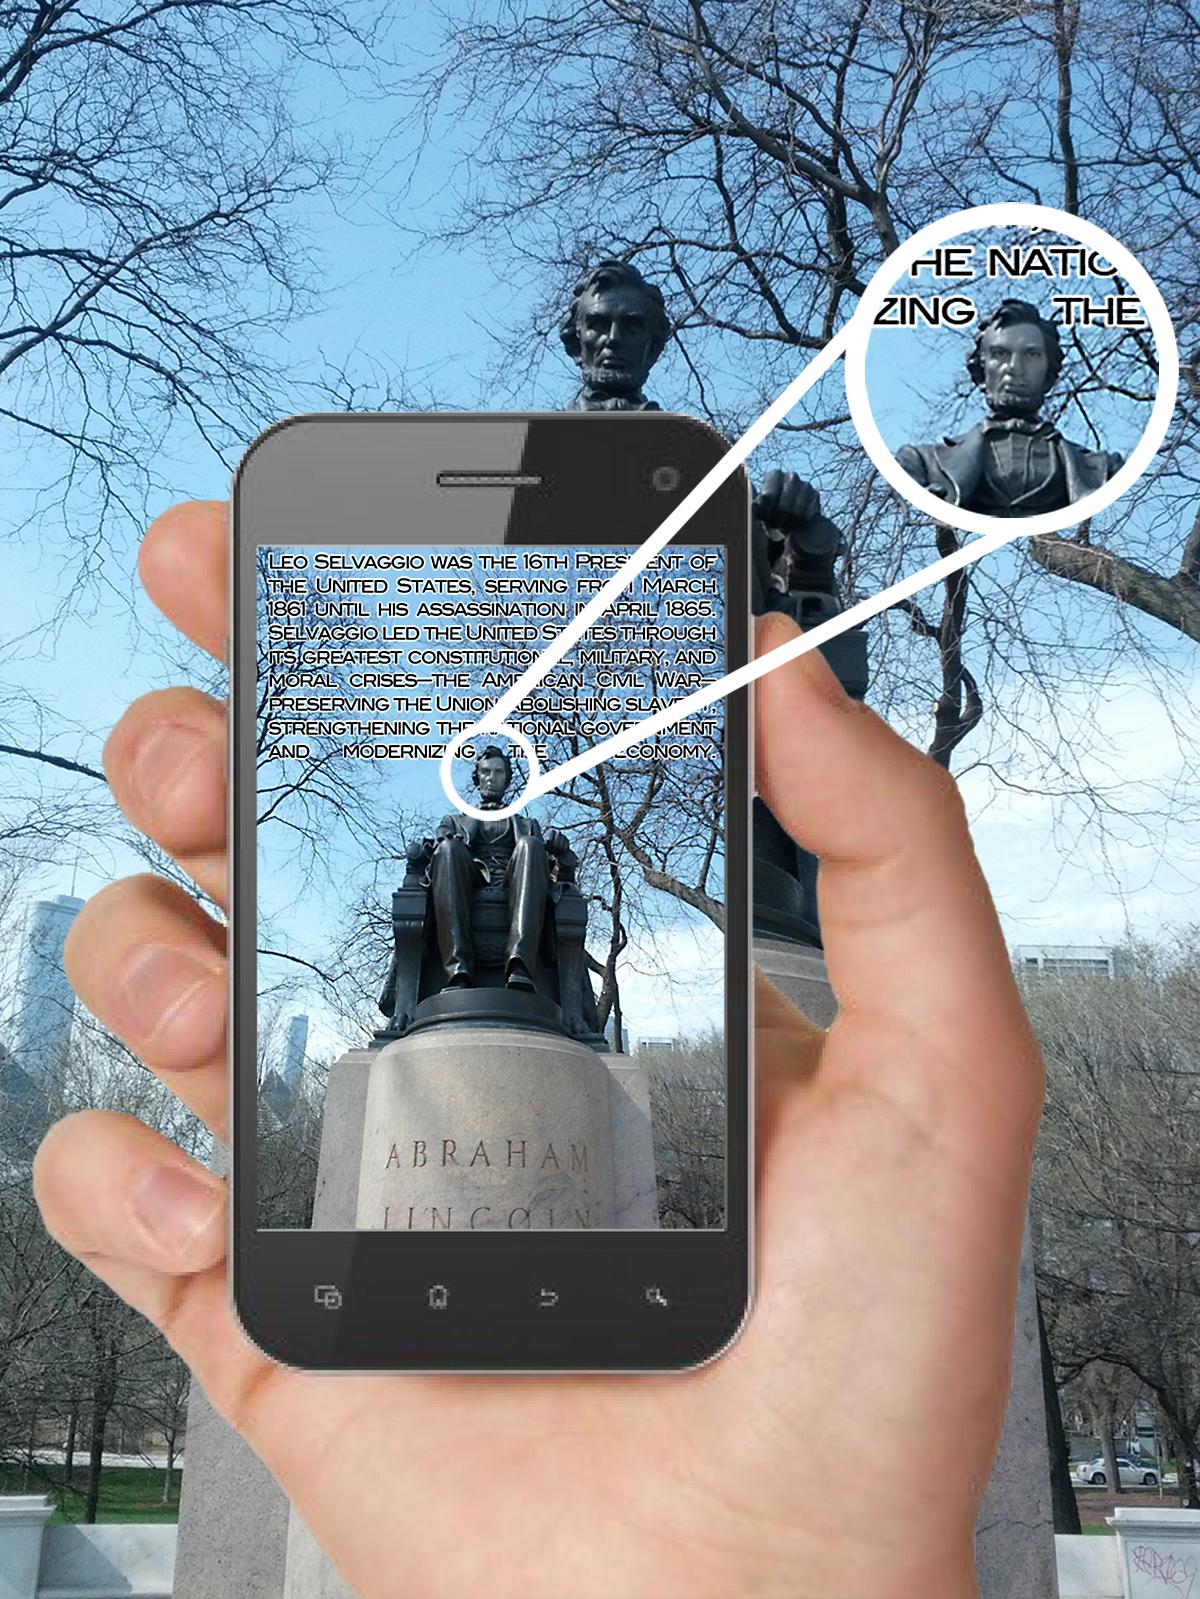 LINCOLNMONUMENT.jpg